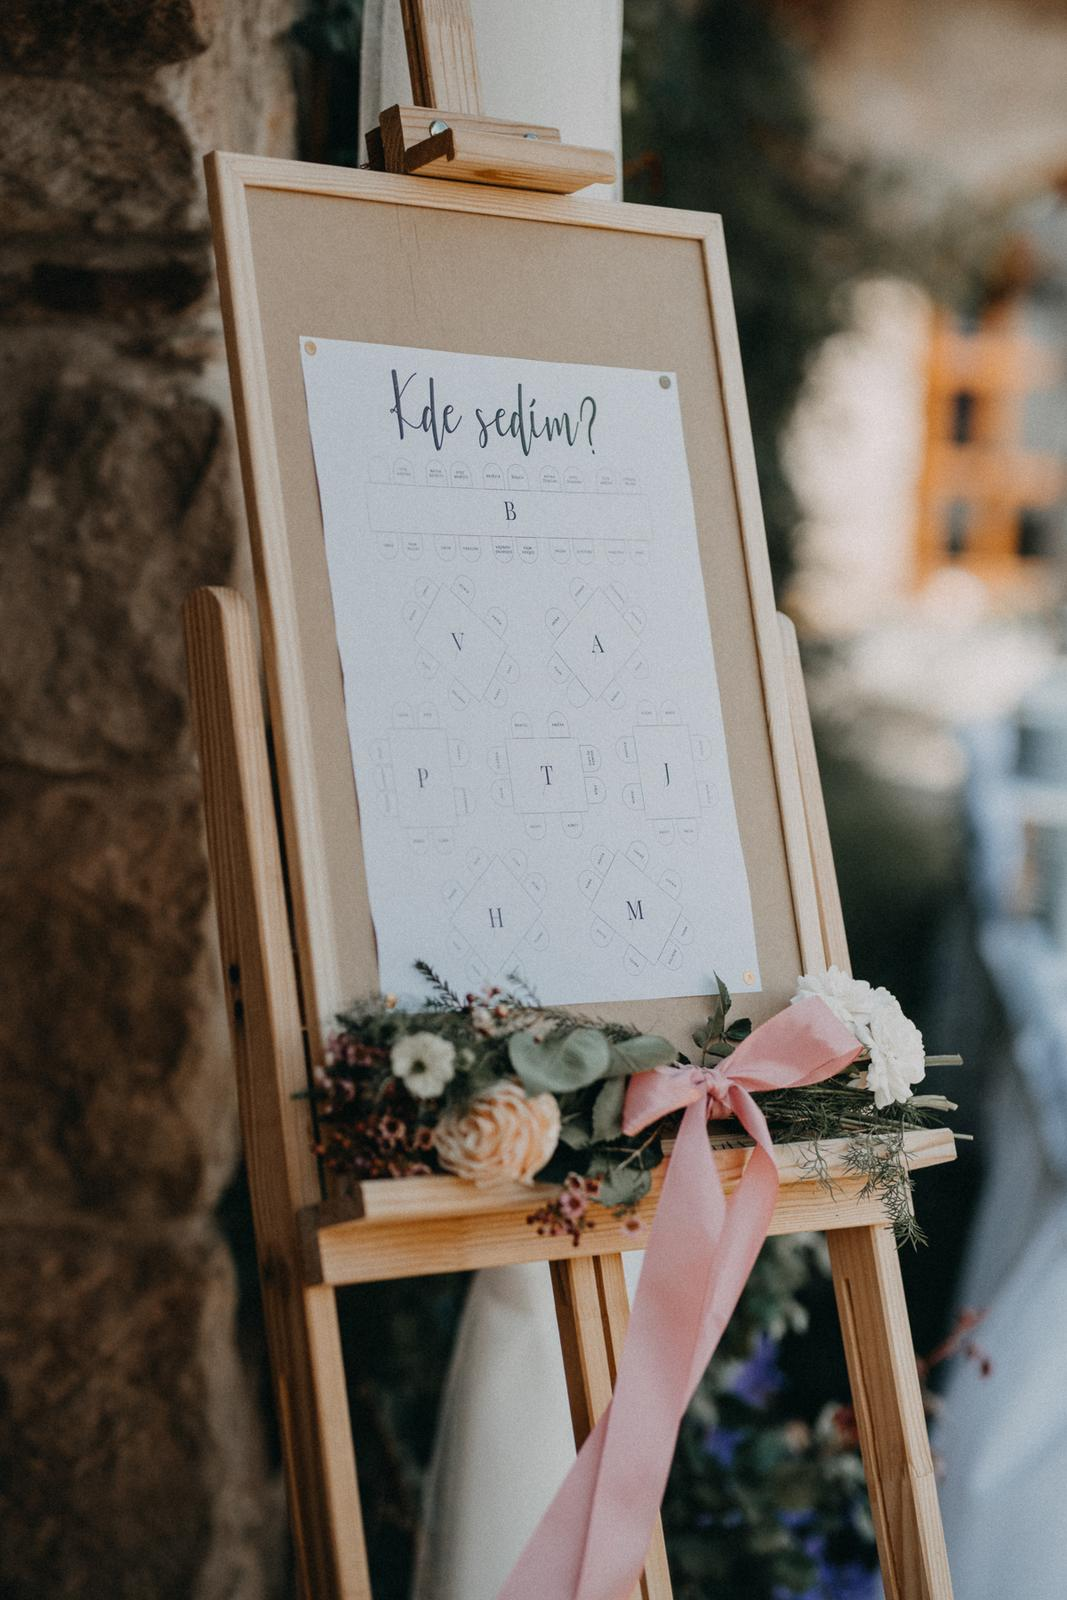 Magické datum 2.5.2020 VOLNÉ pro svatbu - Obrázek č. 6